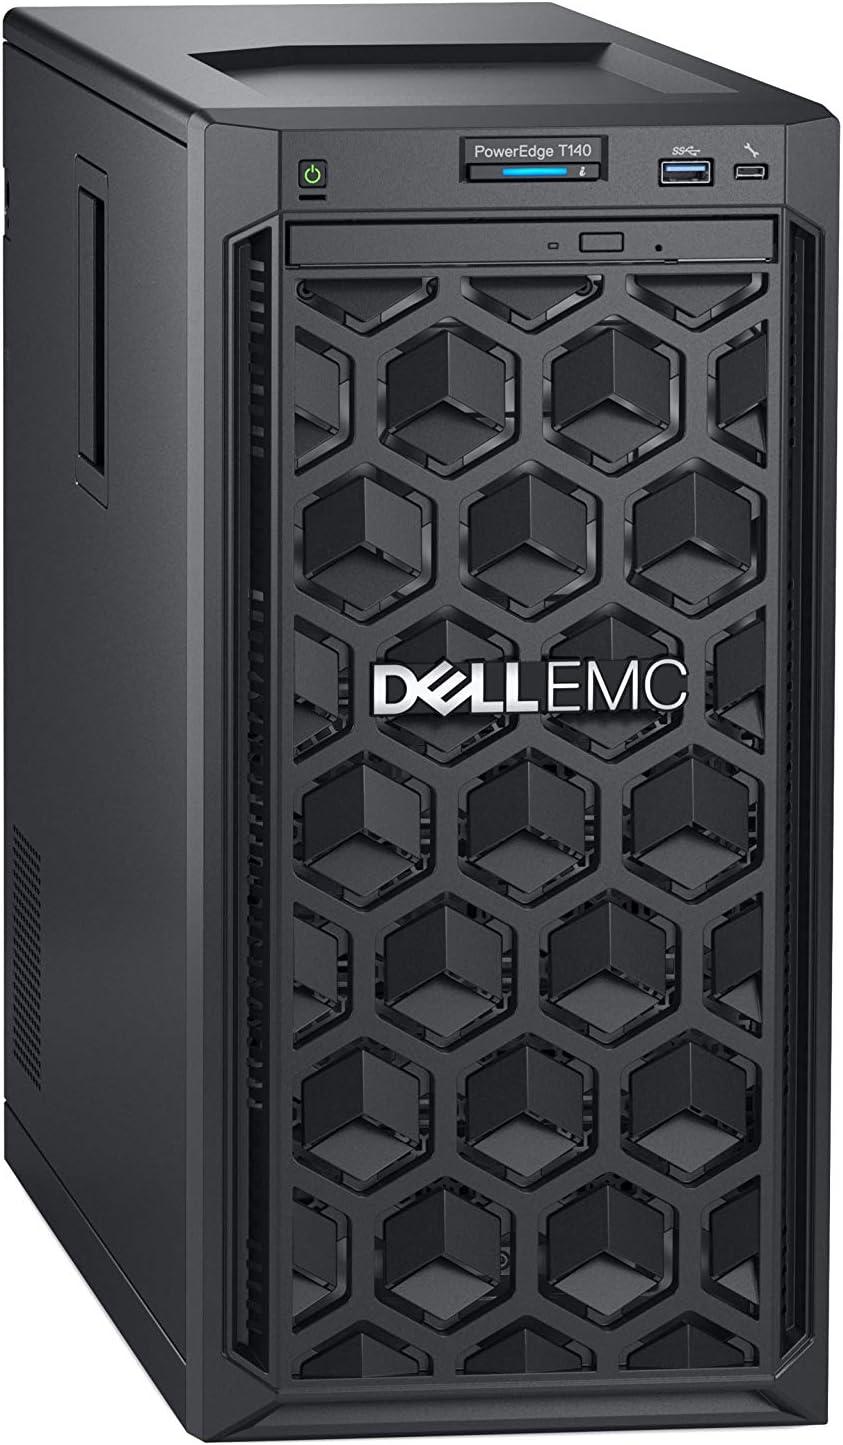 Dell EMC POWEREDGE T140 XEON